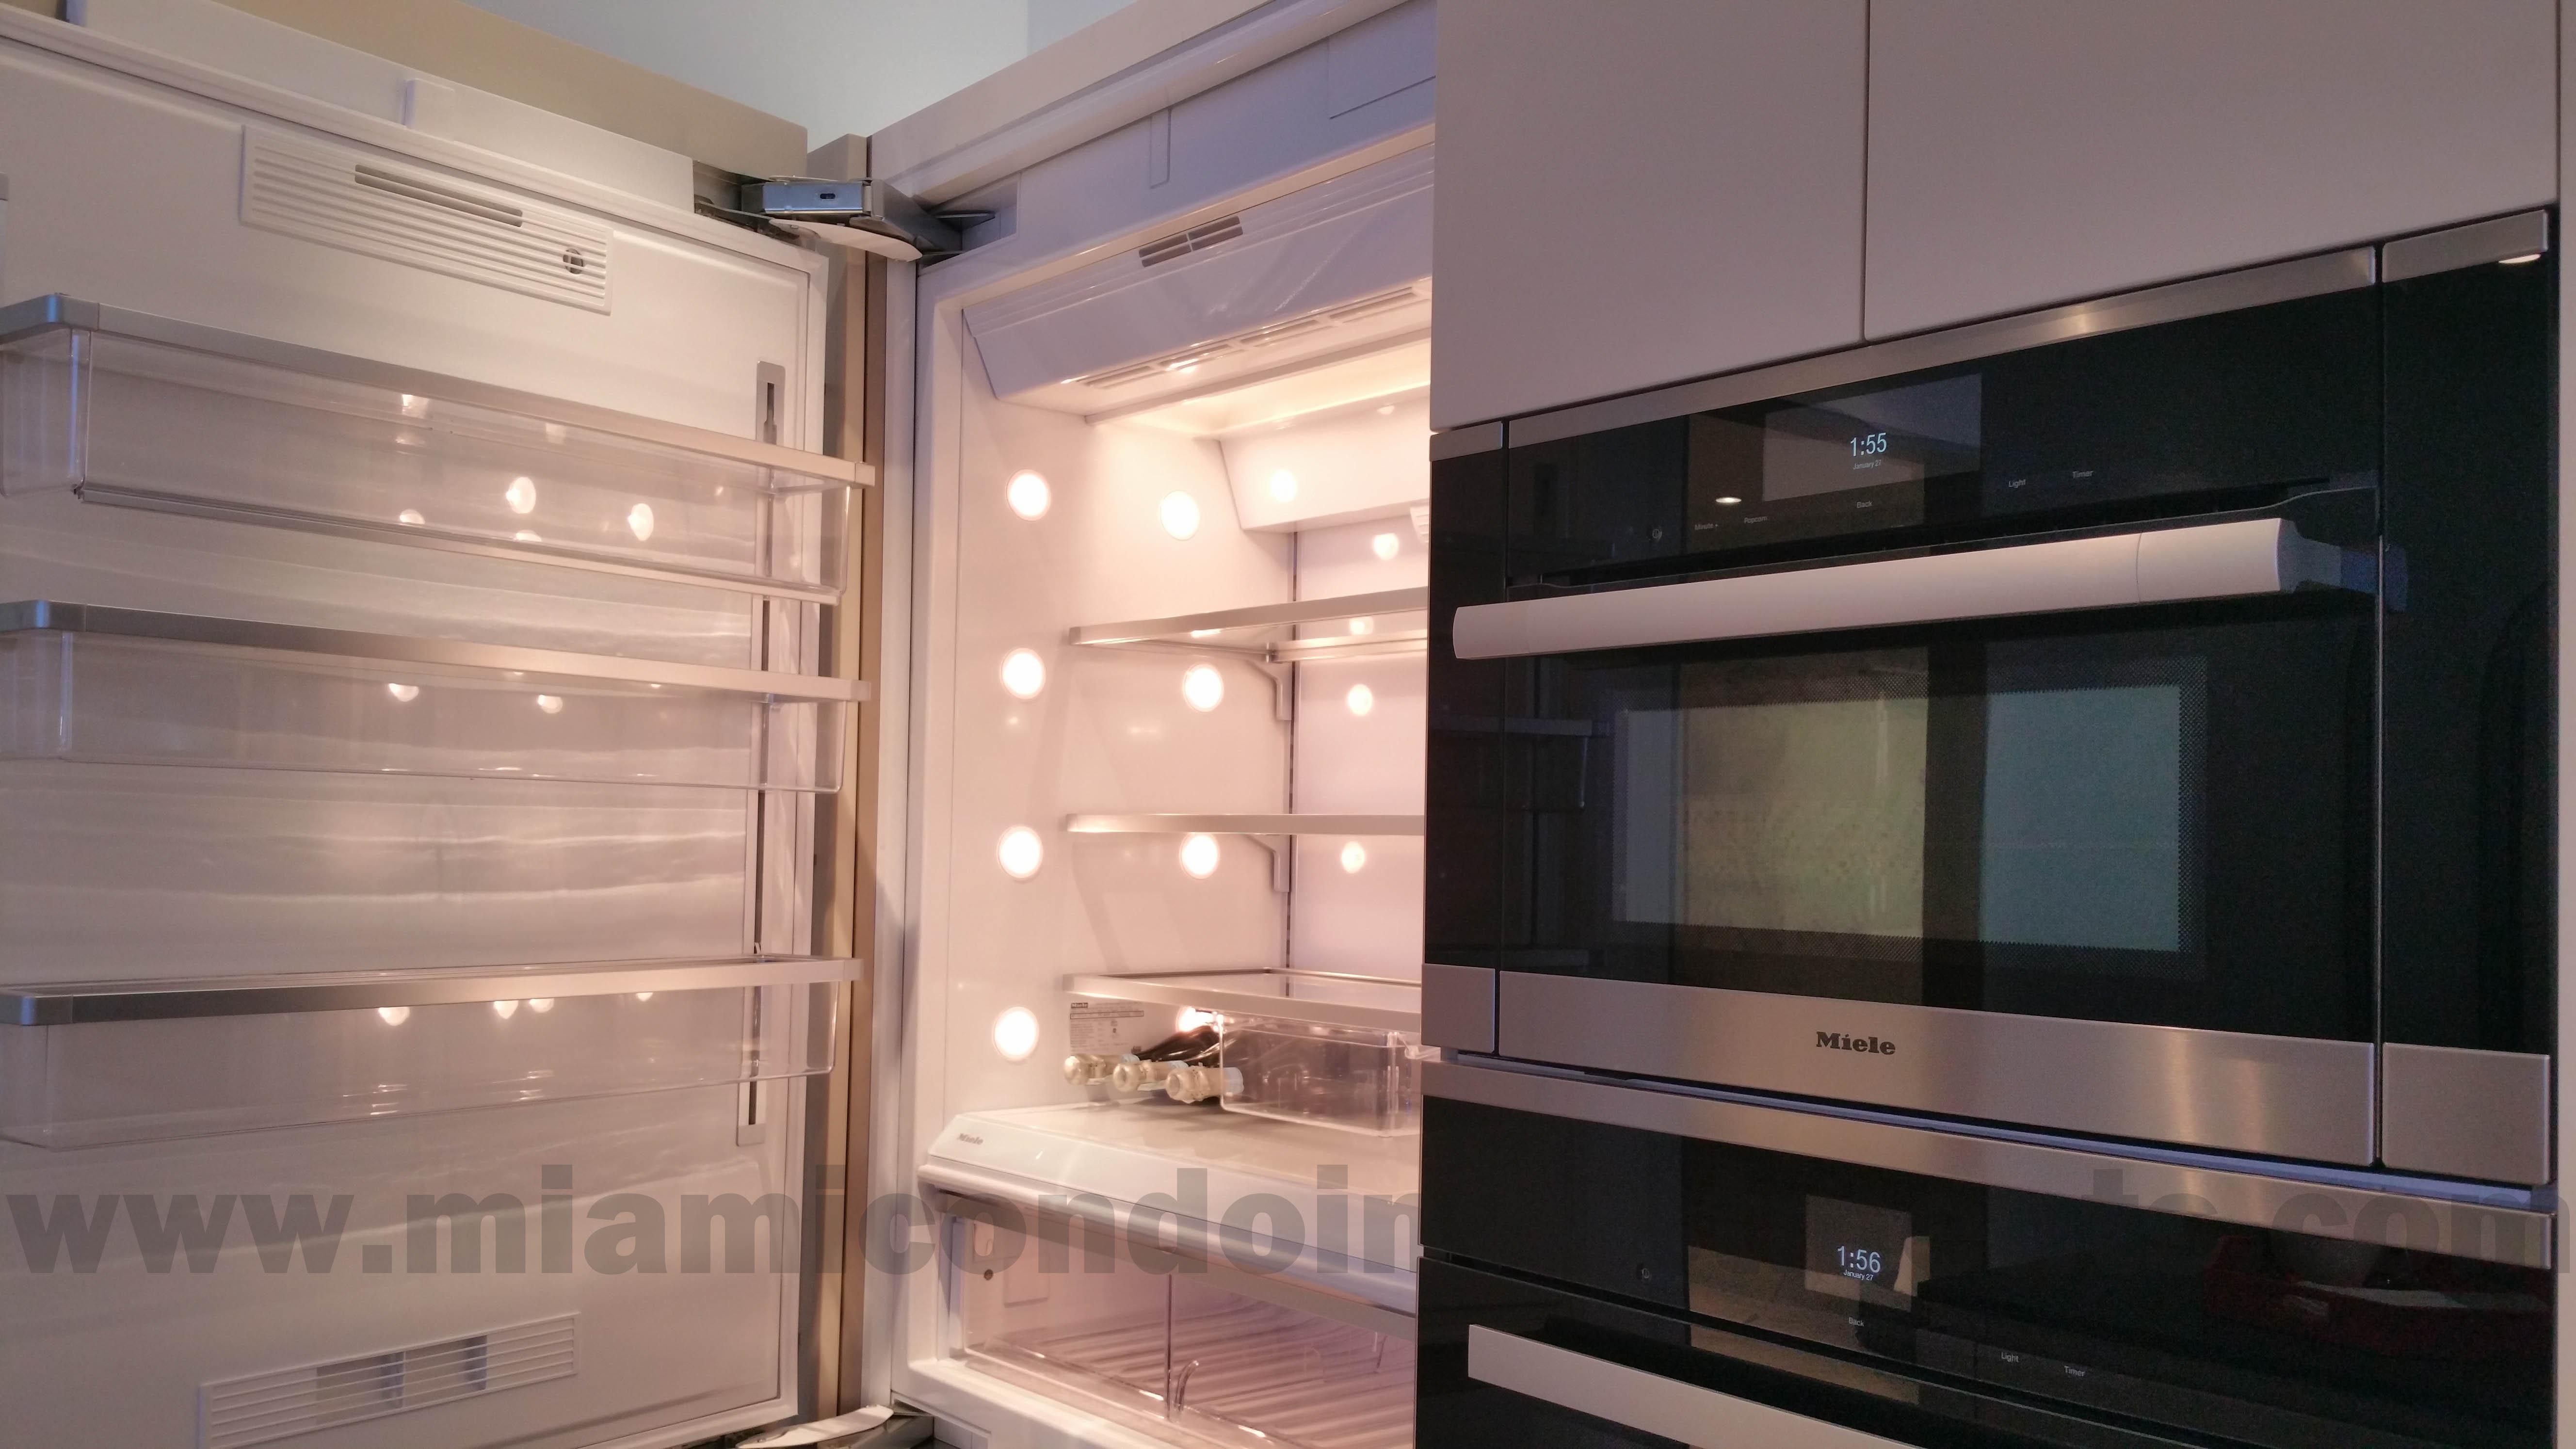 Miele refrigerator